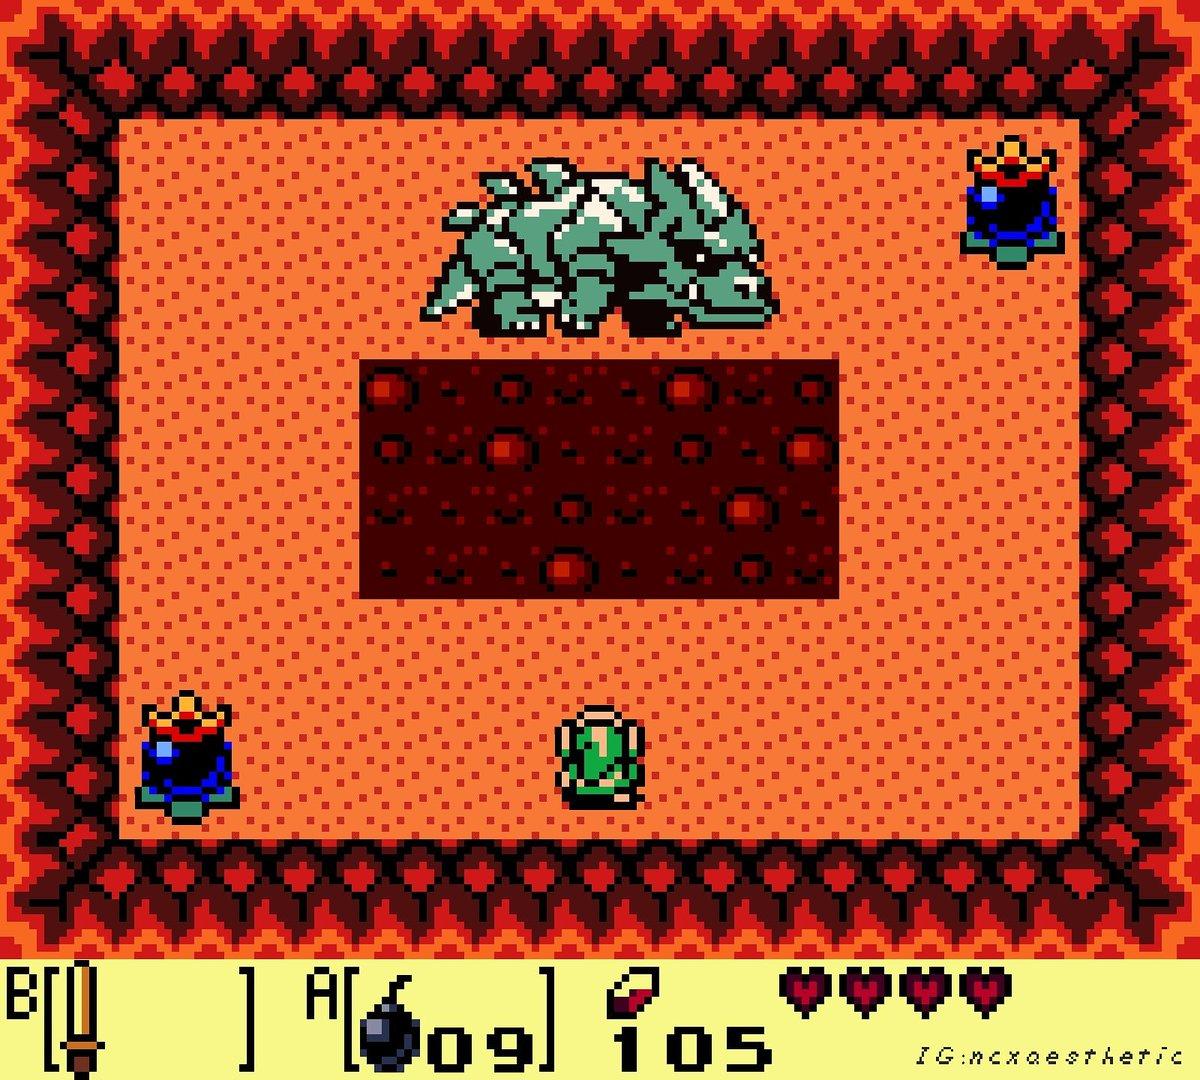 N8 Bit On Twitter The Legend Of Zelda Ocarina Of Time 8